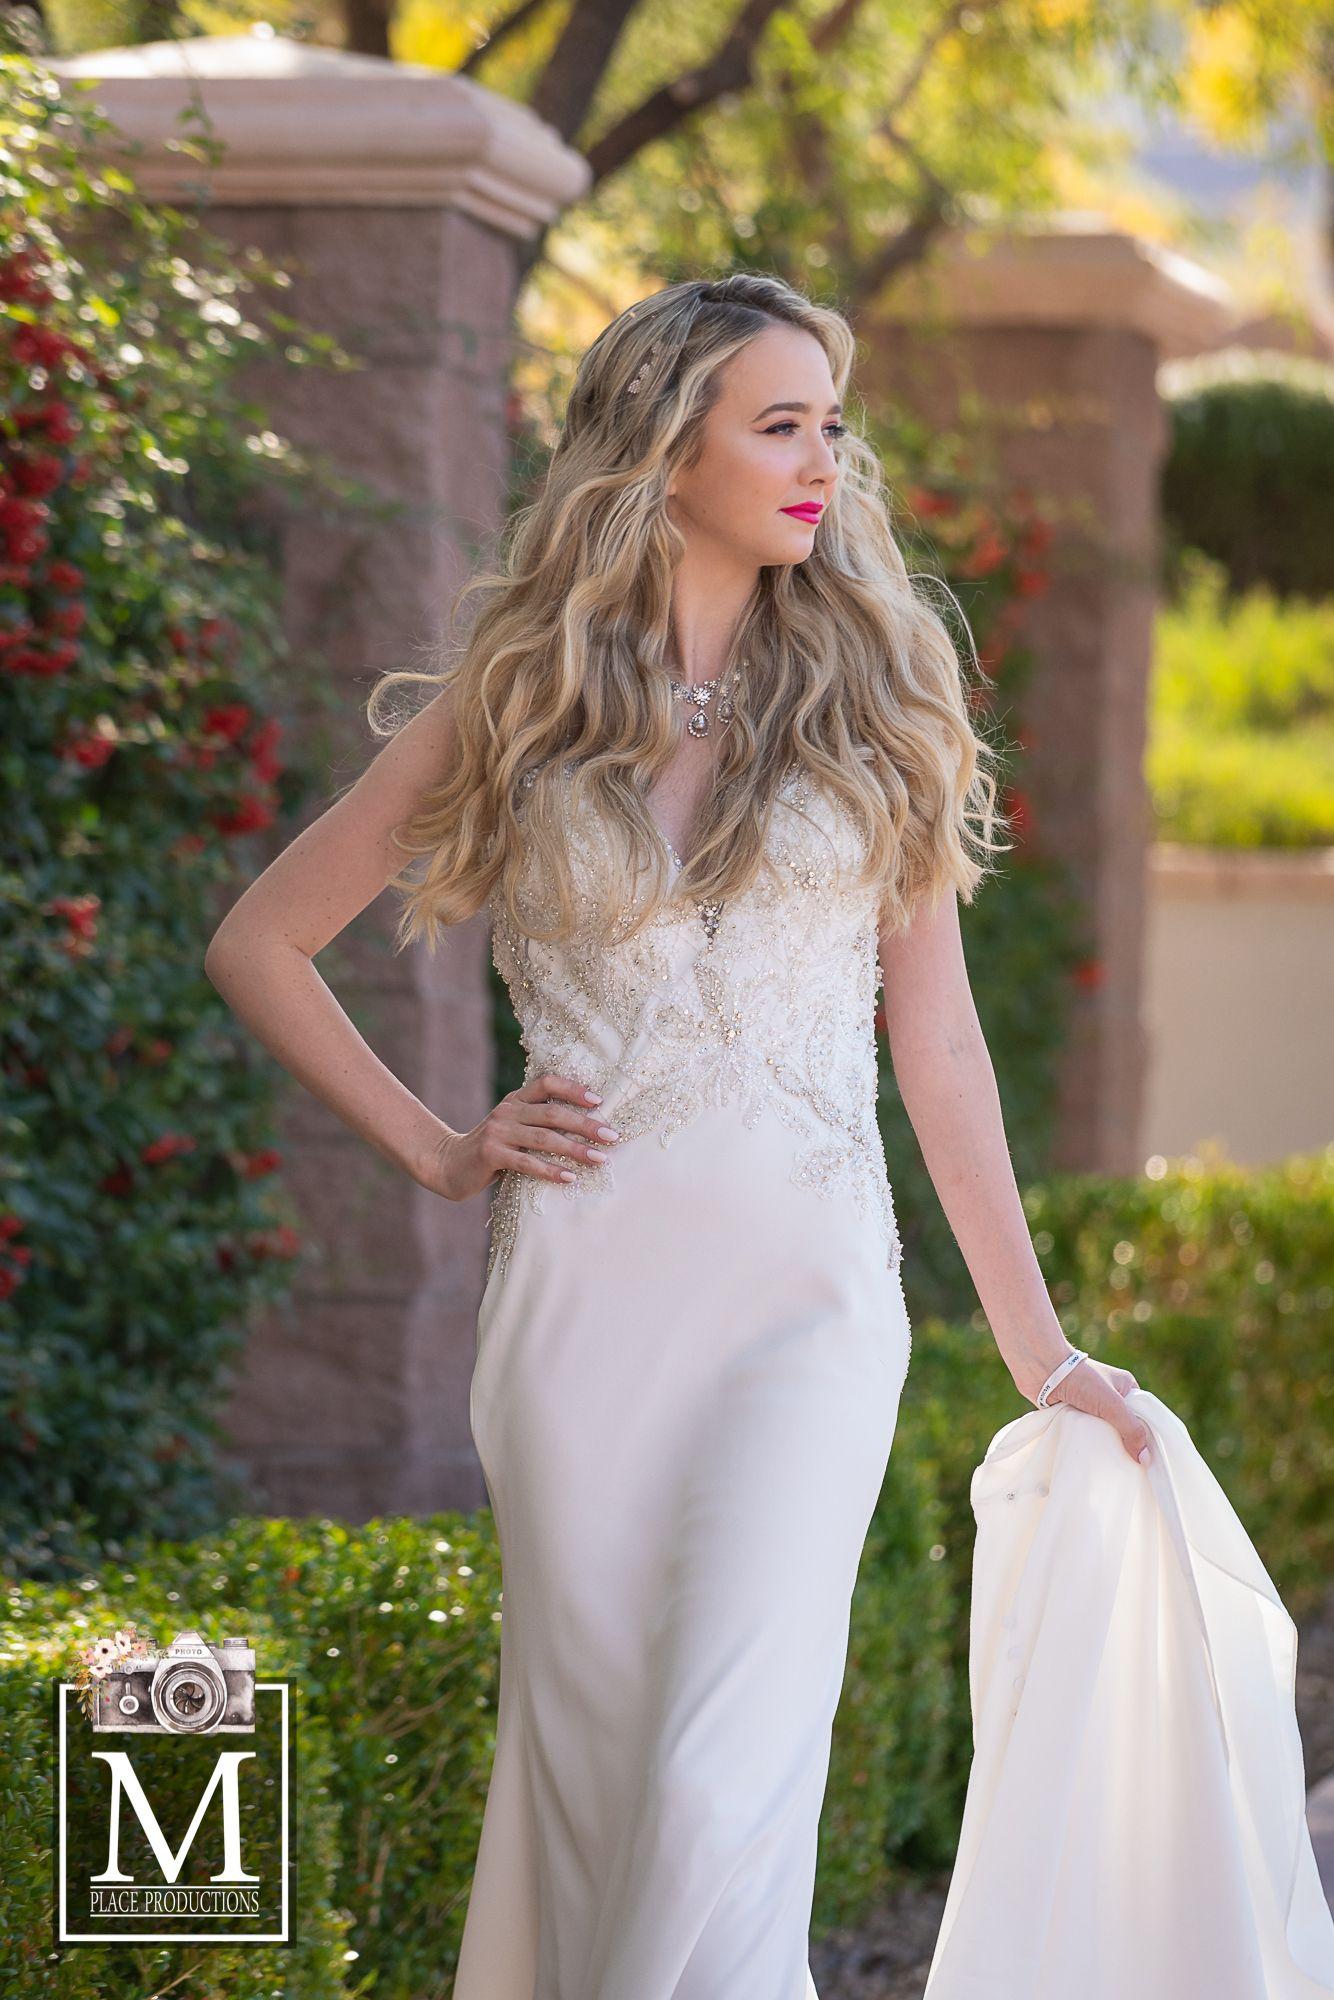 Summer Bridal Gown Las Vegas Weddings Wedding Dresses Bridal Gowns [ 2000 x 1334 Pixel ]